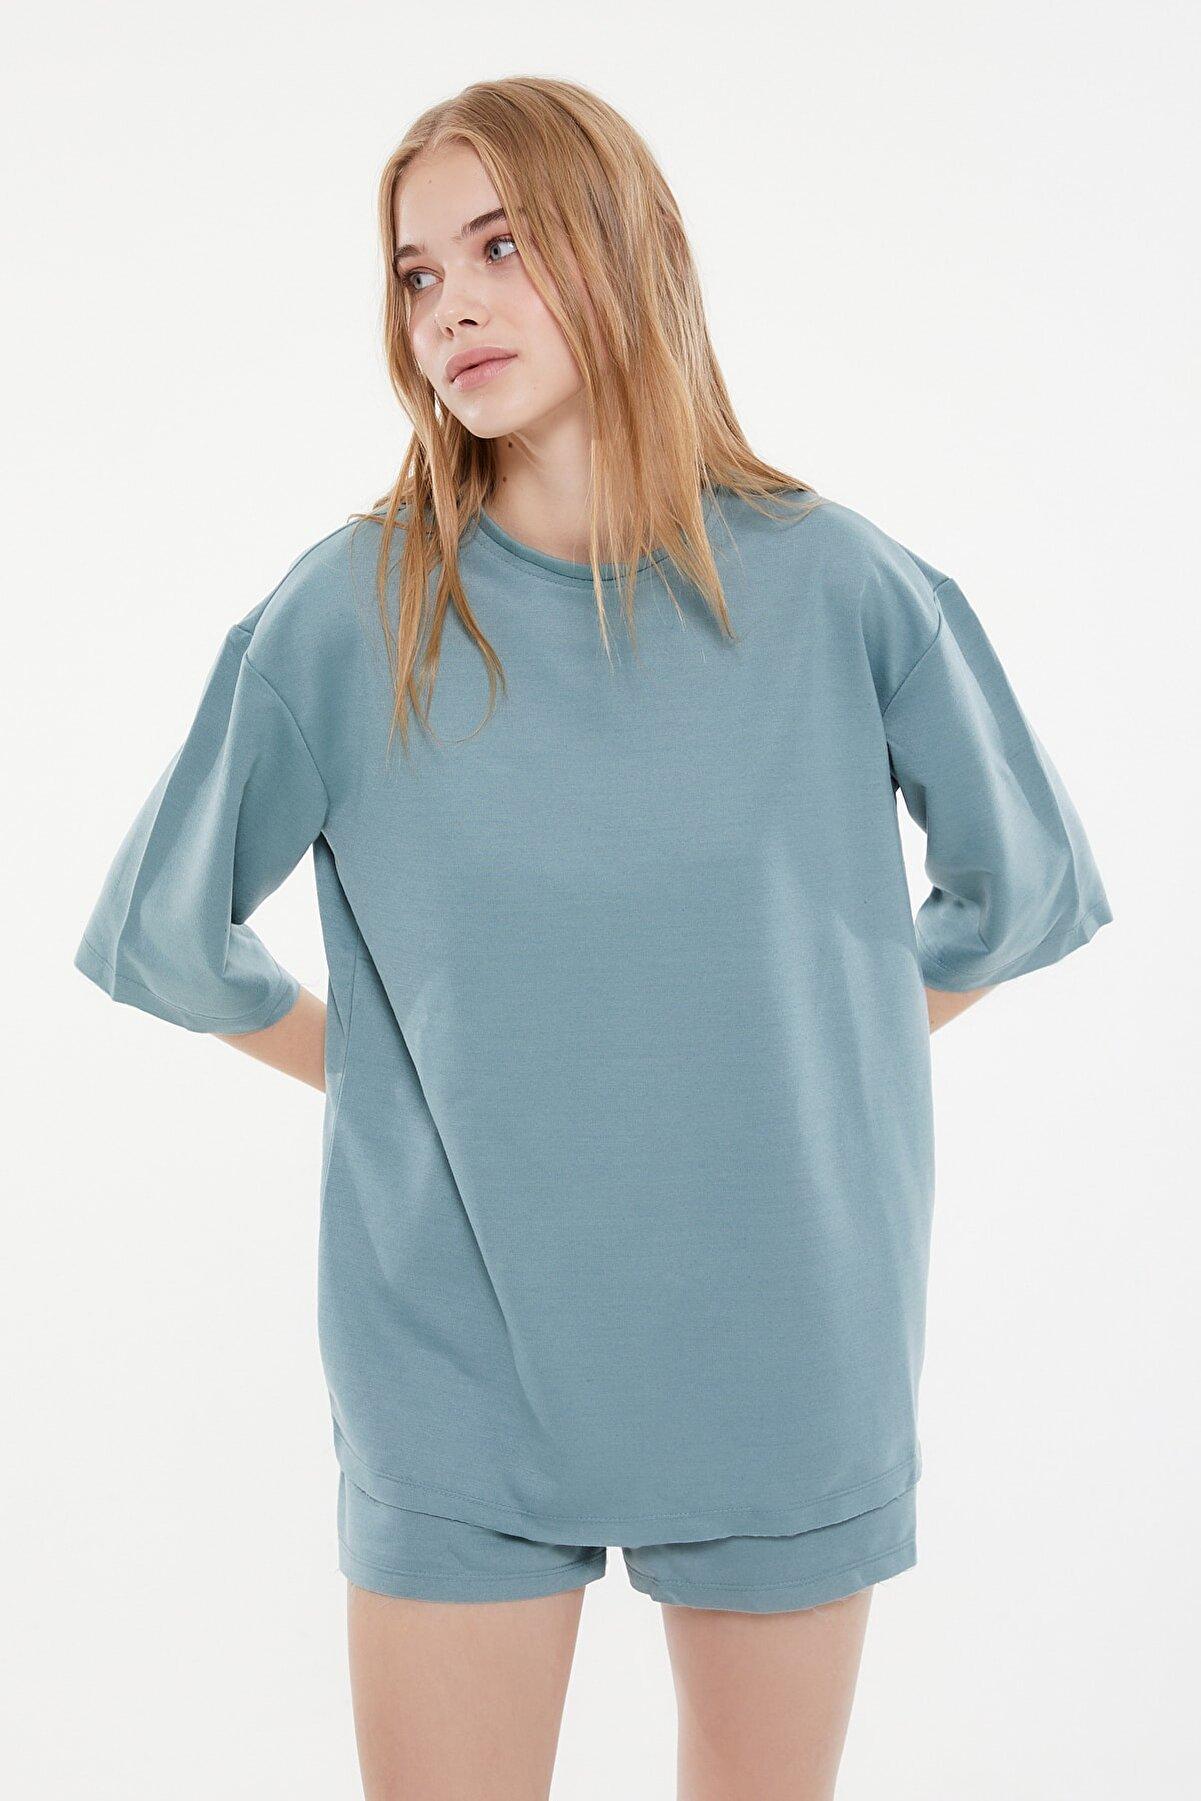 TRENDYOLMİLLA Mint Örme Pijama Takımı THMSS21PT0164